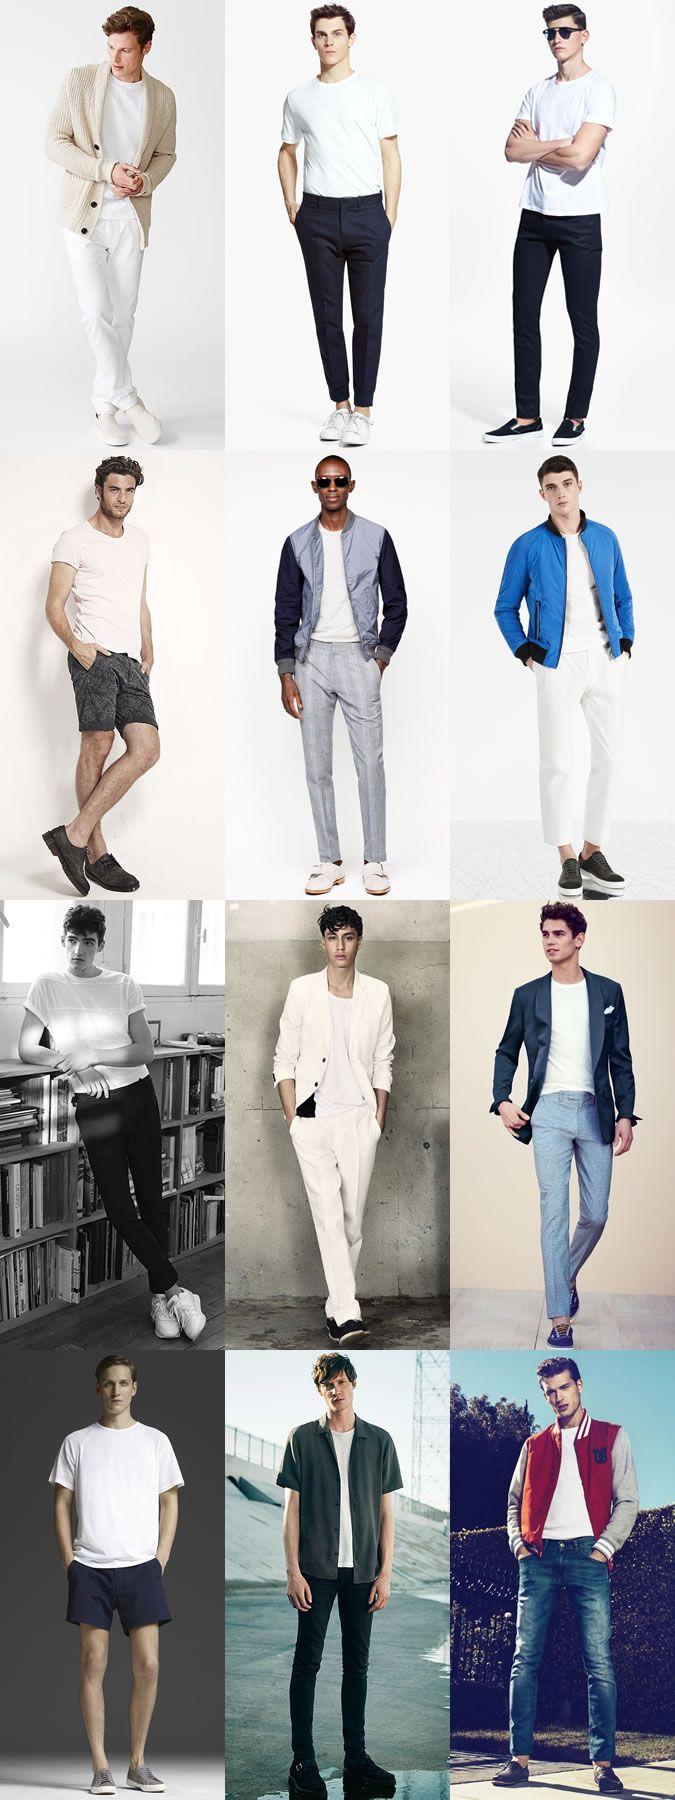 Shirts Recommendations for Men in Summer#mens tops#mens designer t shirts